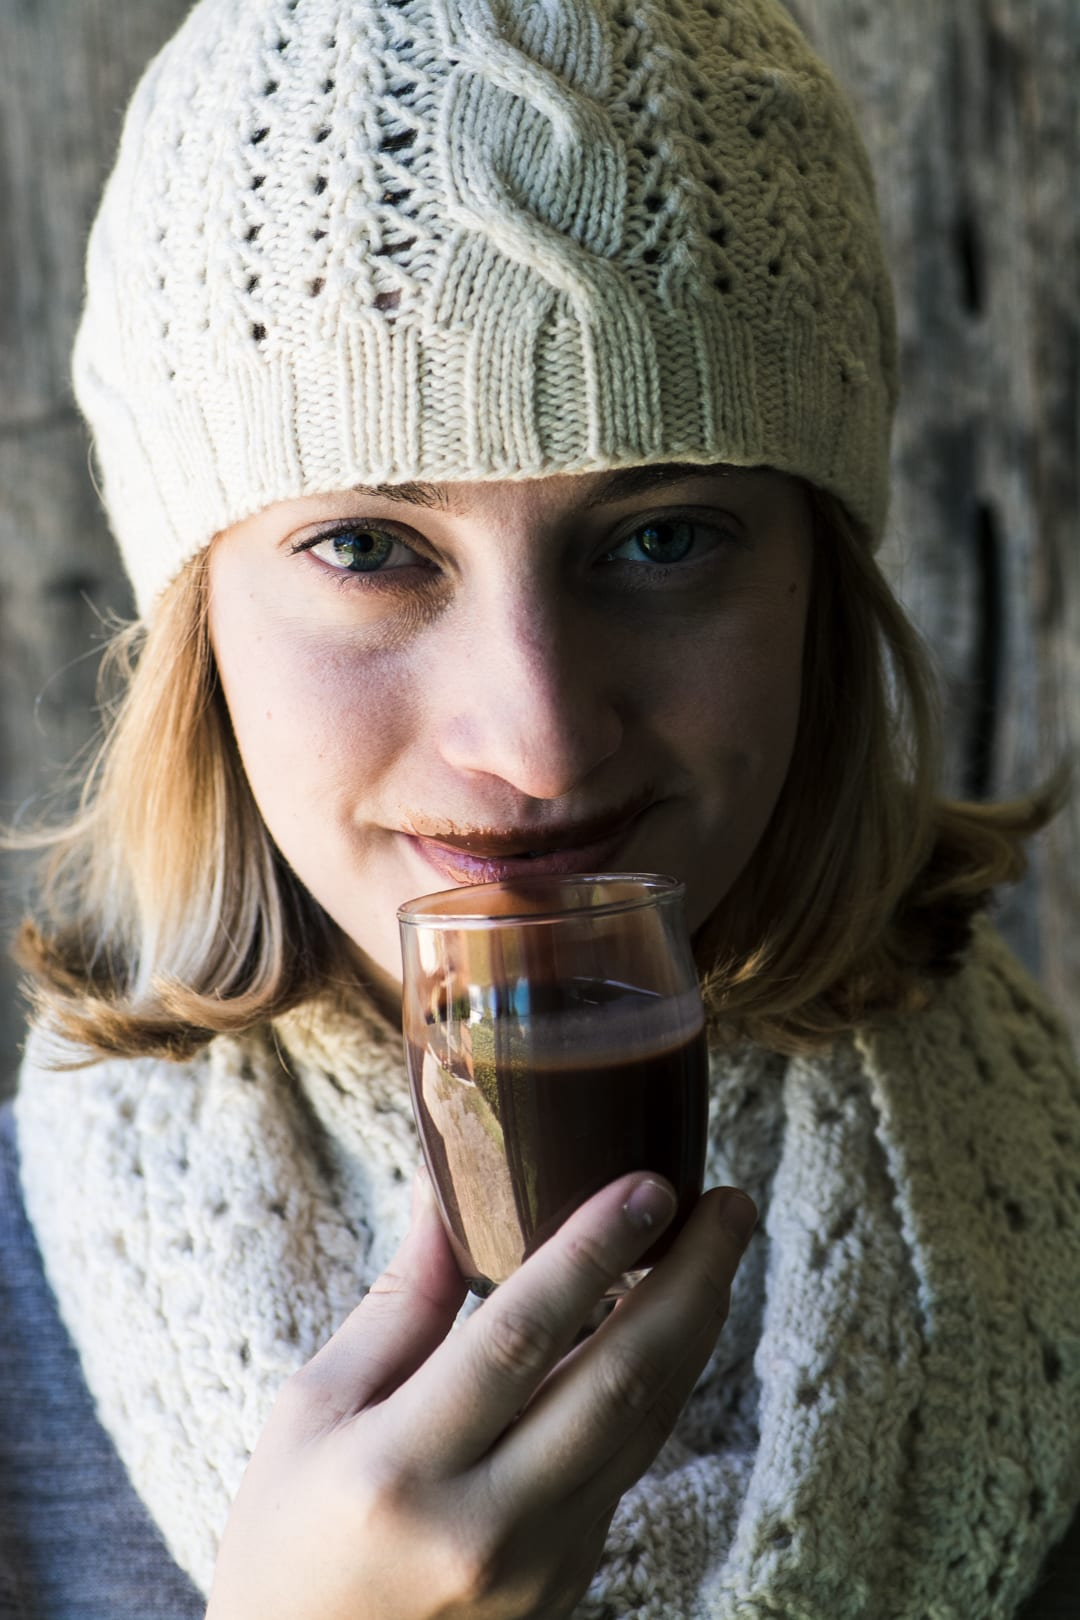 drinkable Nutella mustache!